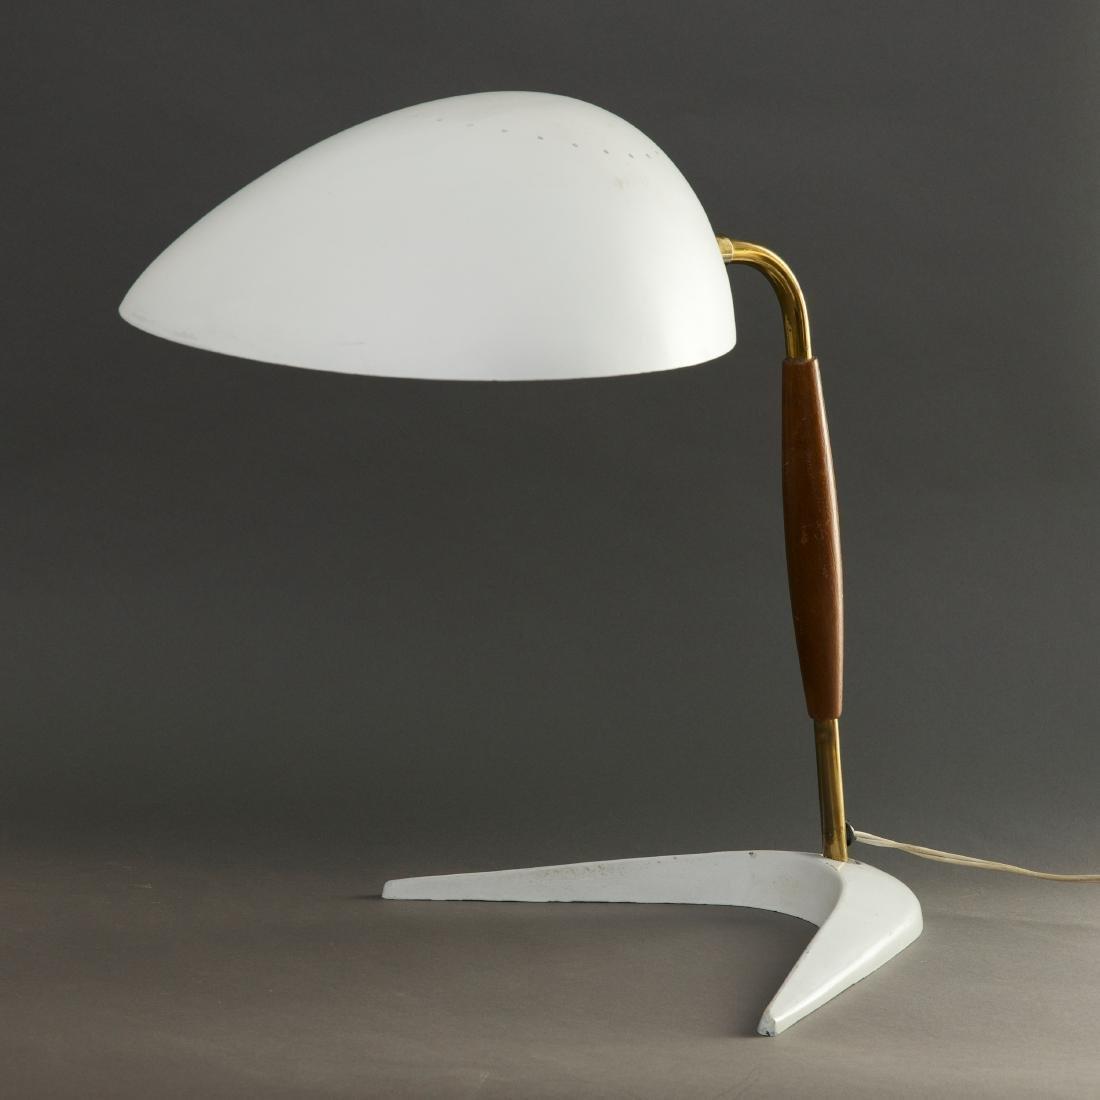 Gerald Thurston Desk Lamp